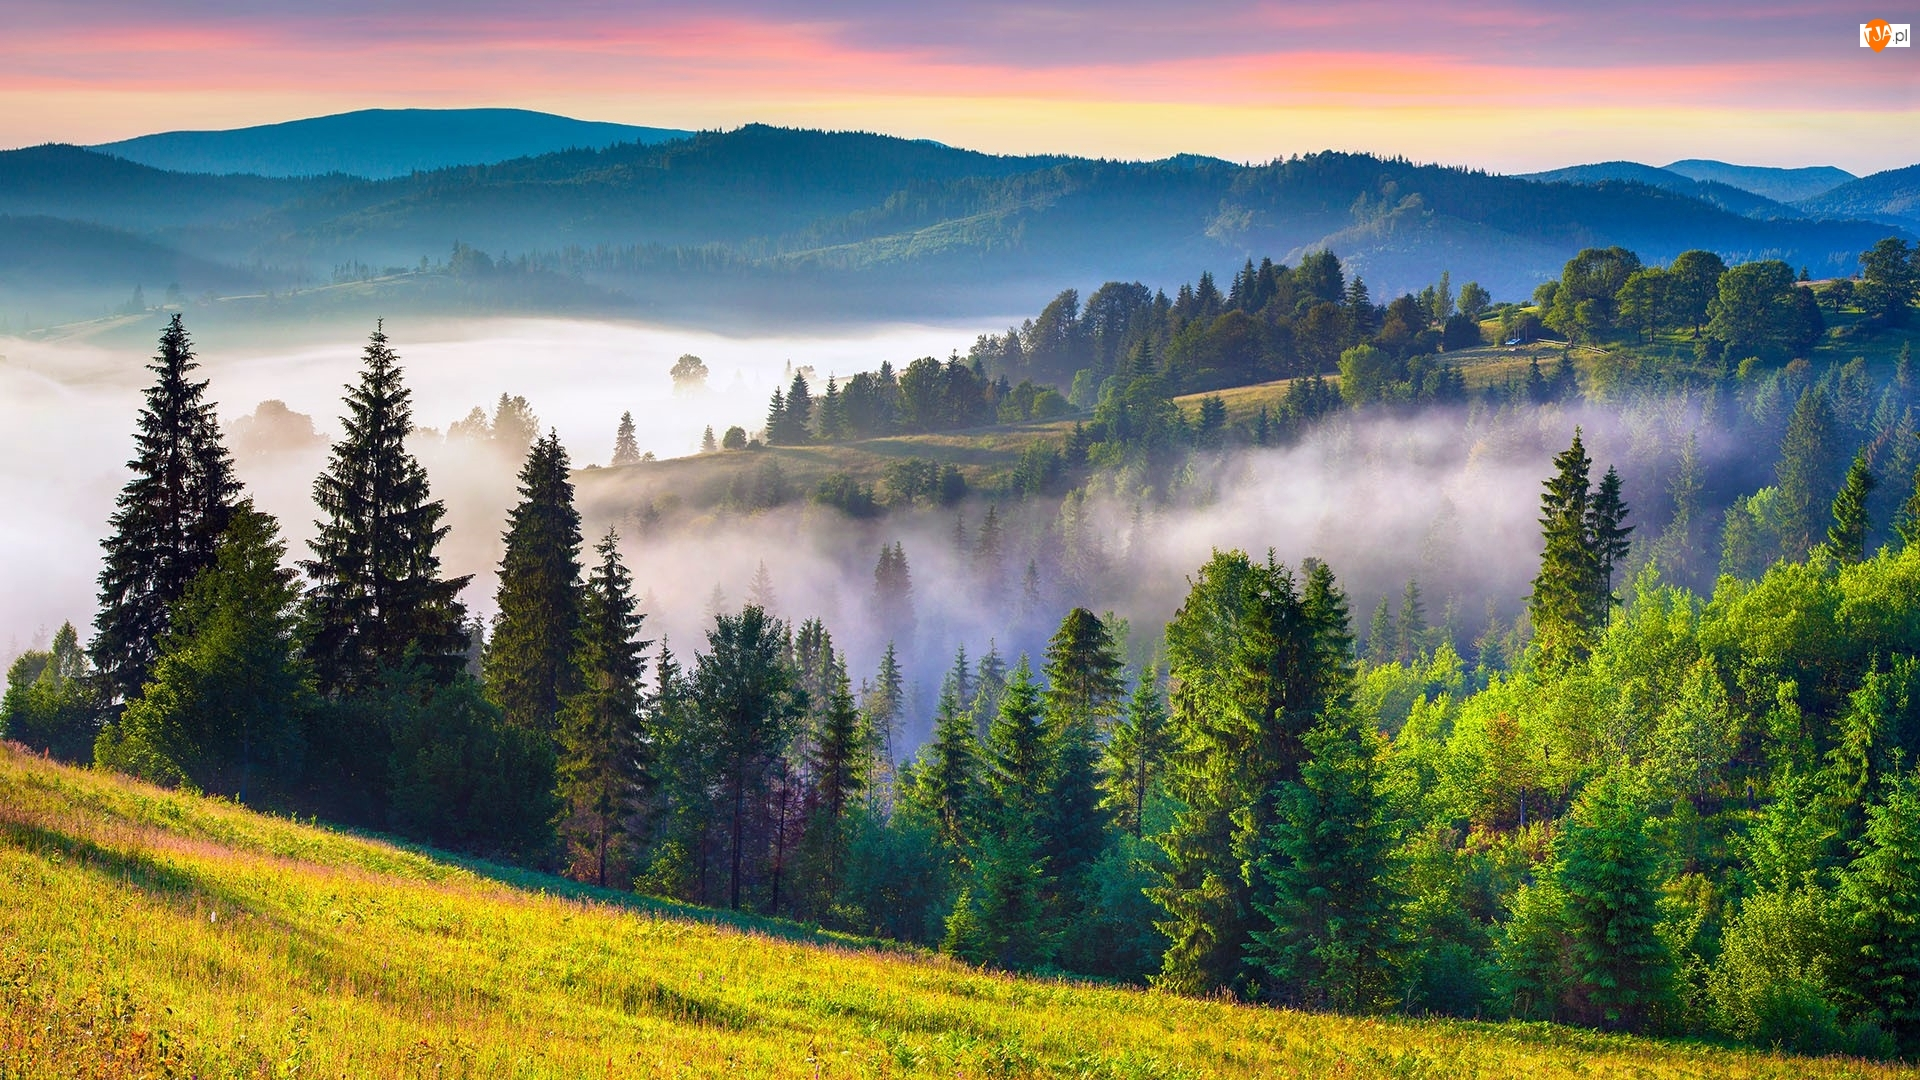 Mgła, Łąka, Lasy, Góry, Wschód słońca